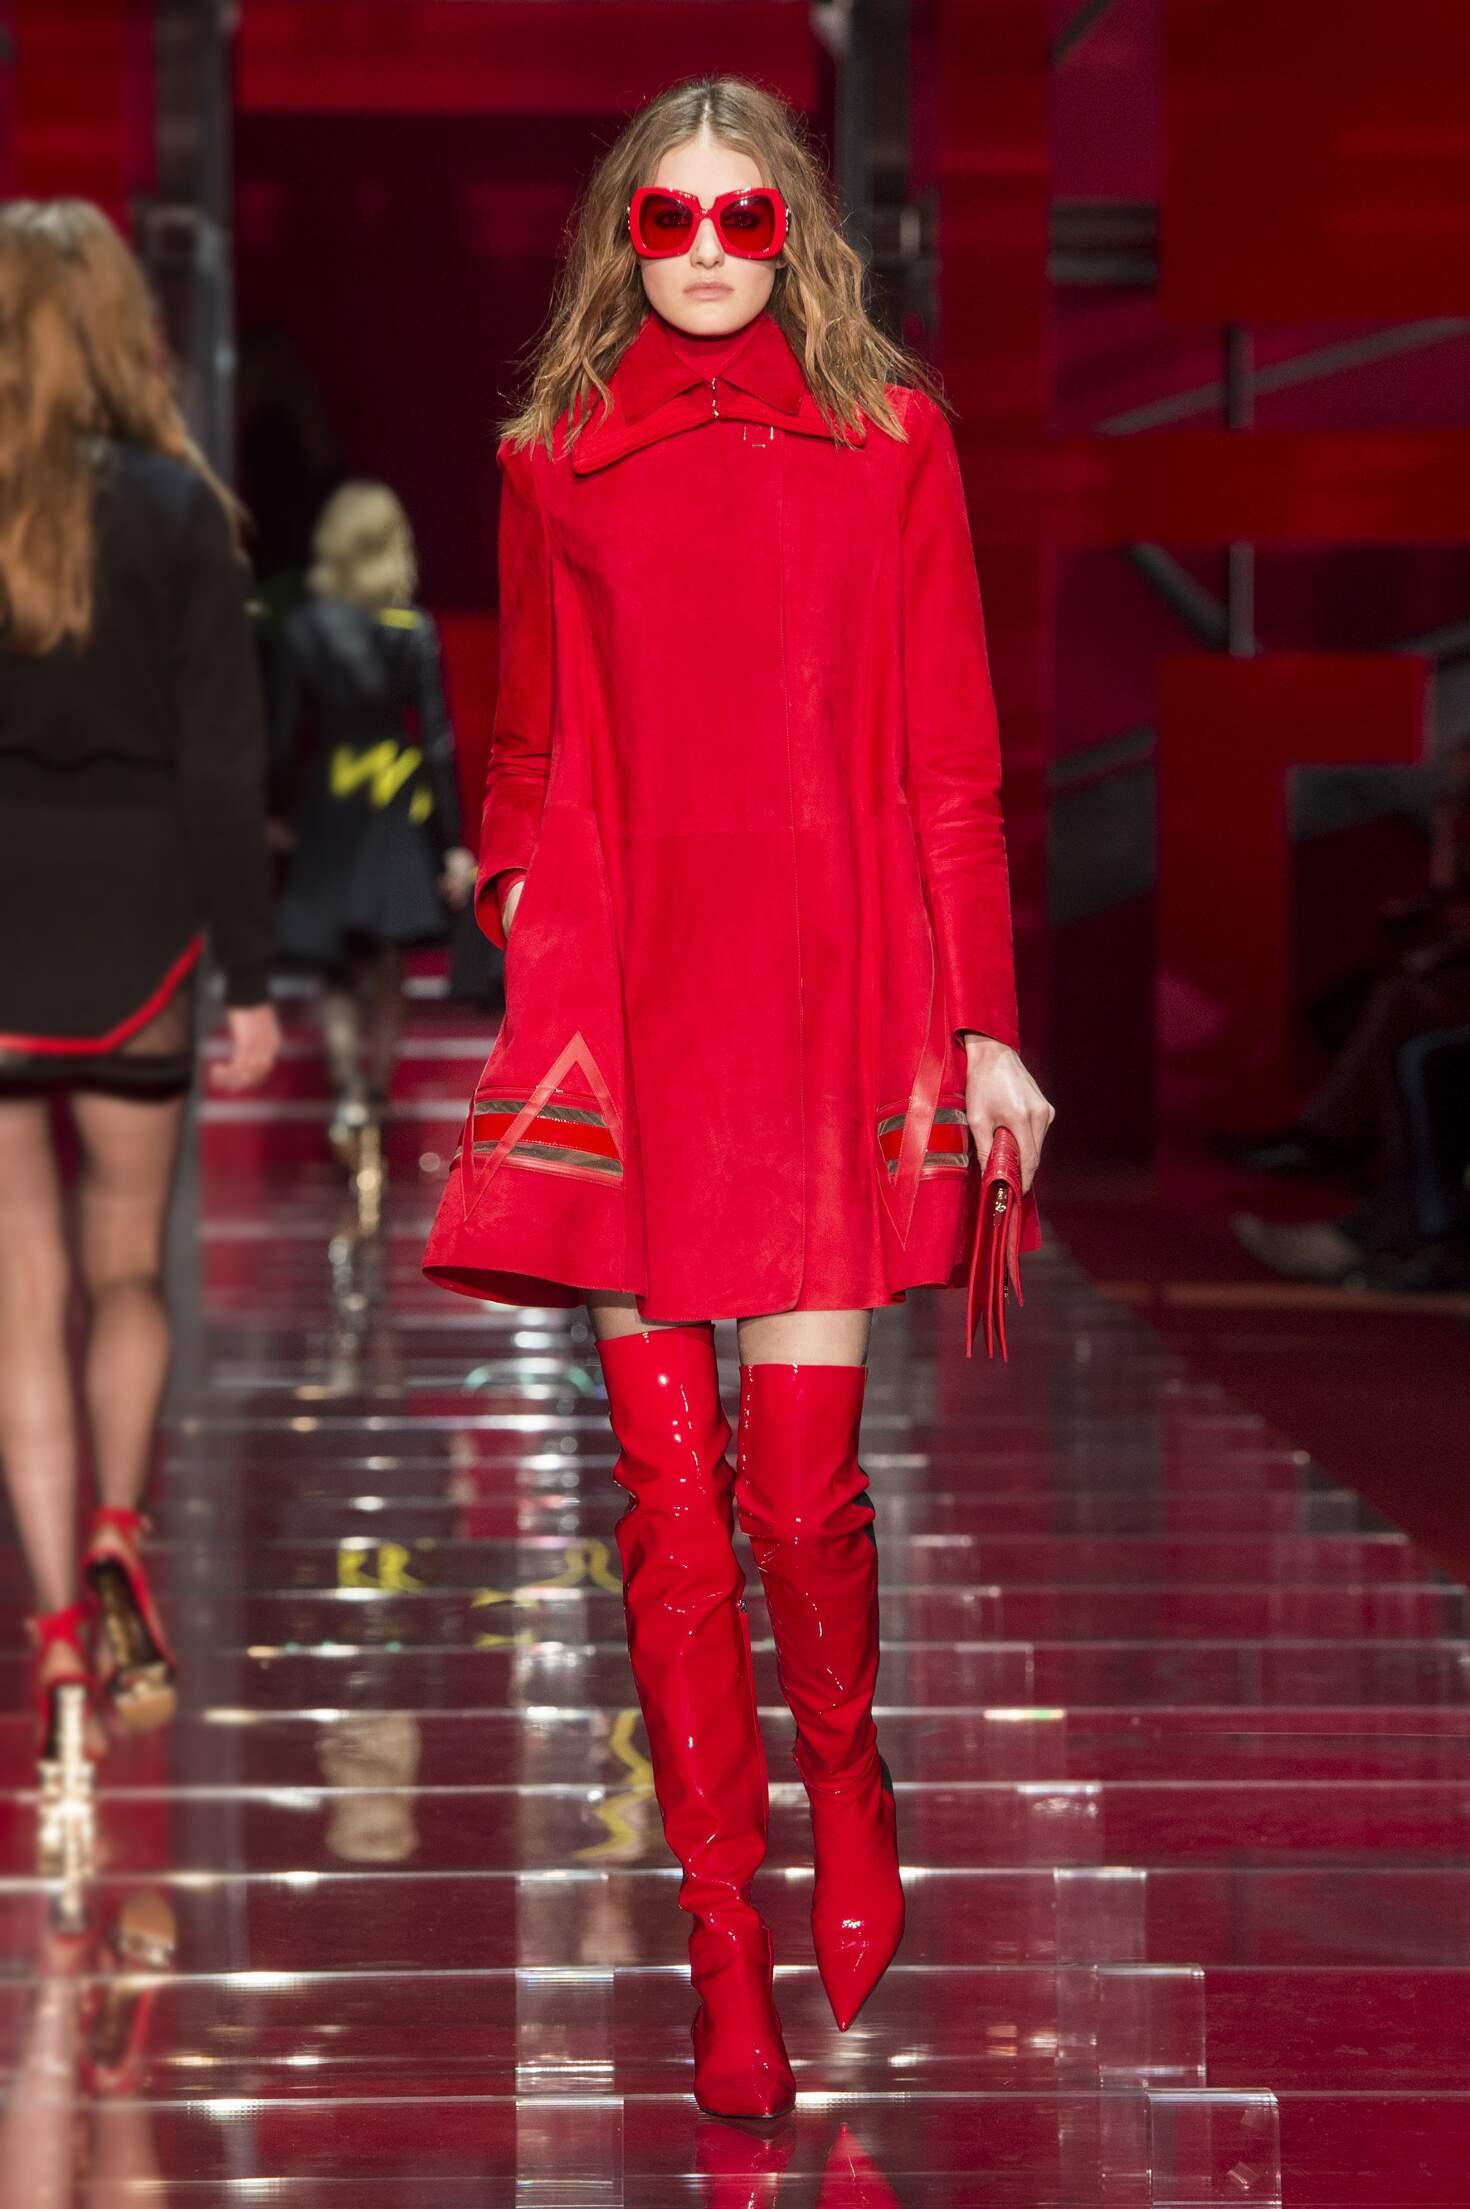 Catwalk Versace Fall Winter 2015 16 Women's Collection Milan Fashion Week